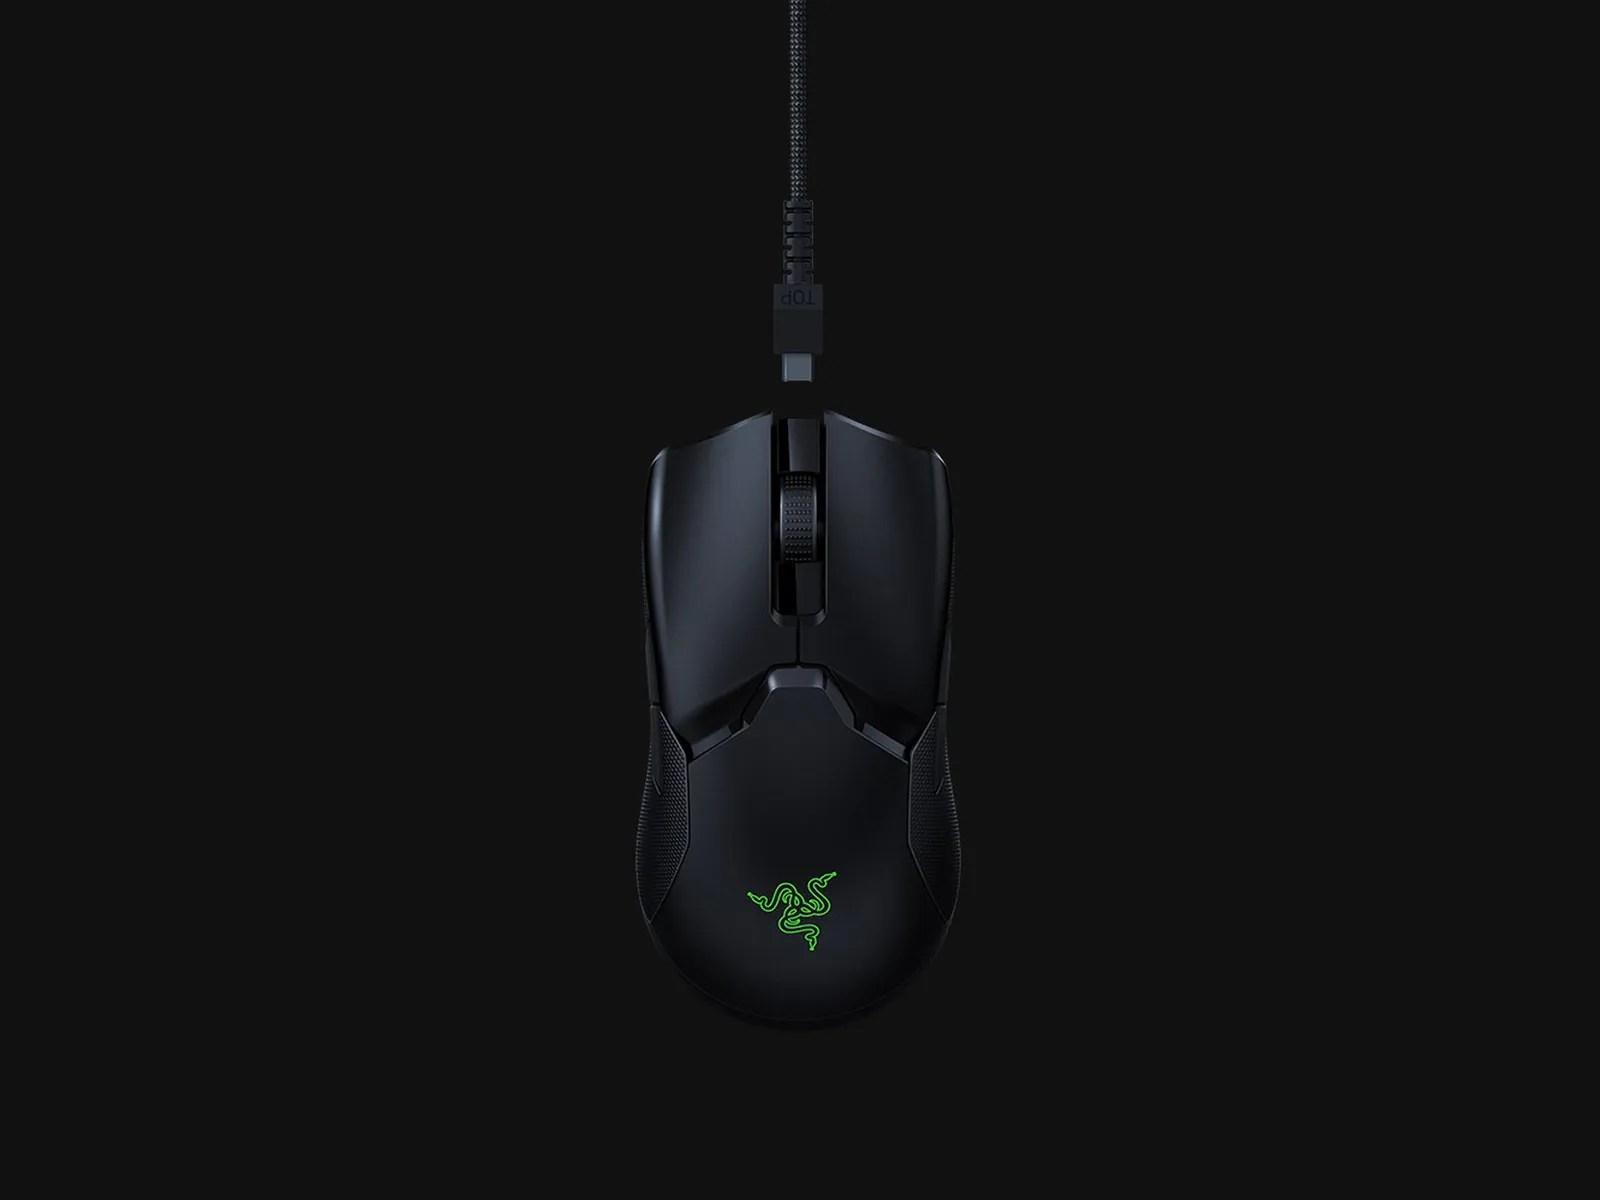 Razer Viper gaming mouse